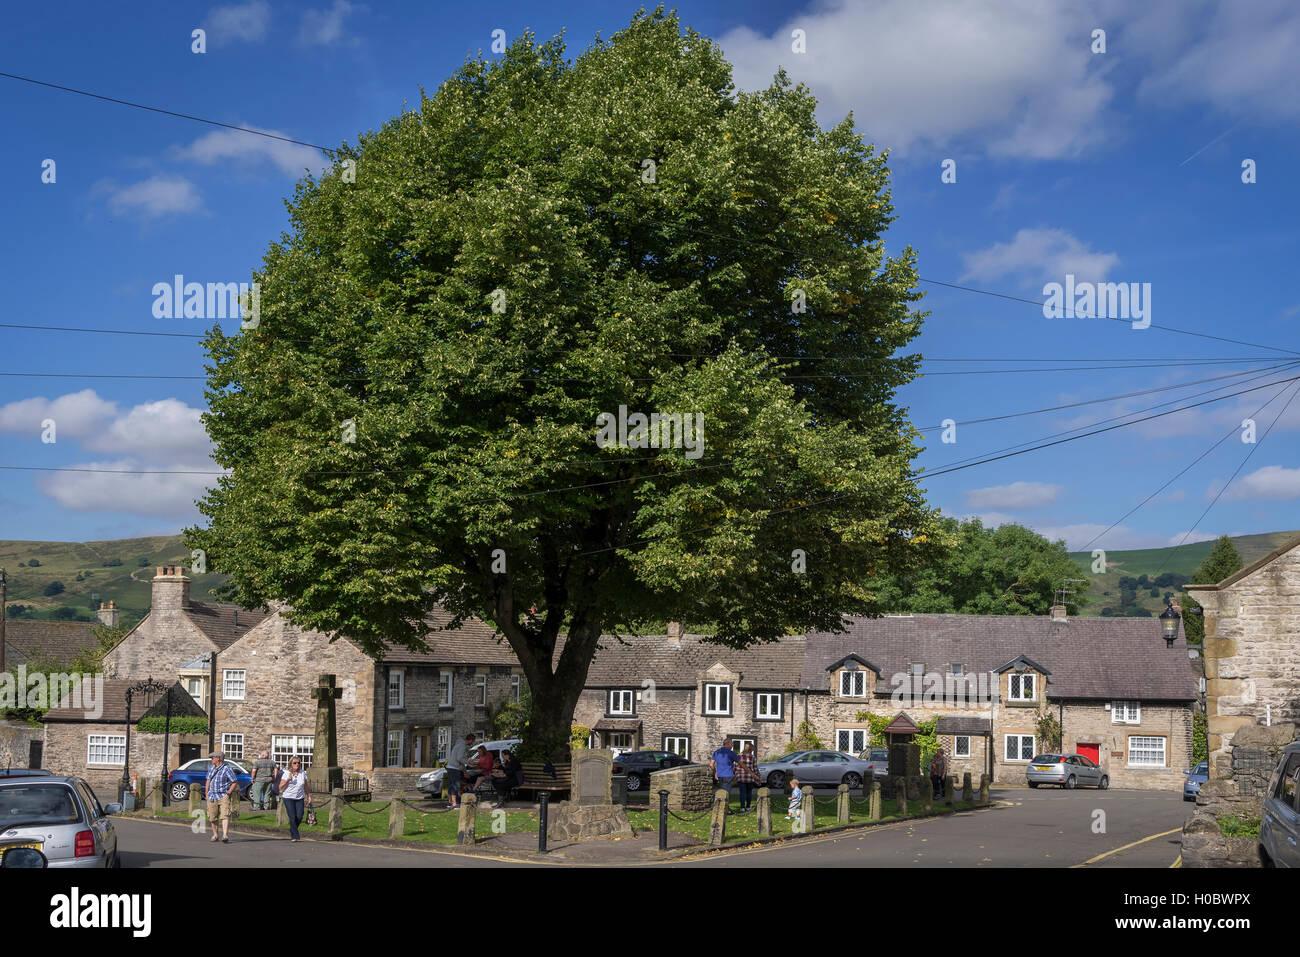 Castleton Derbyshire. North West England. The Market Place. - Stock Image